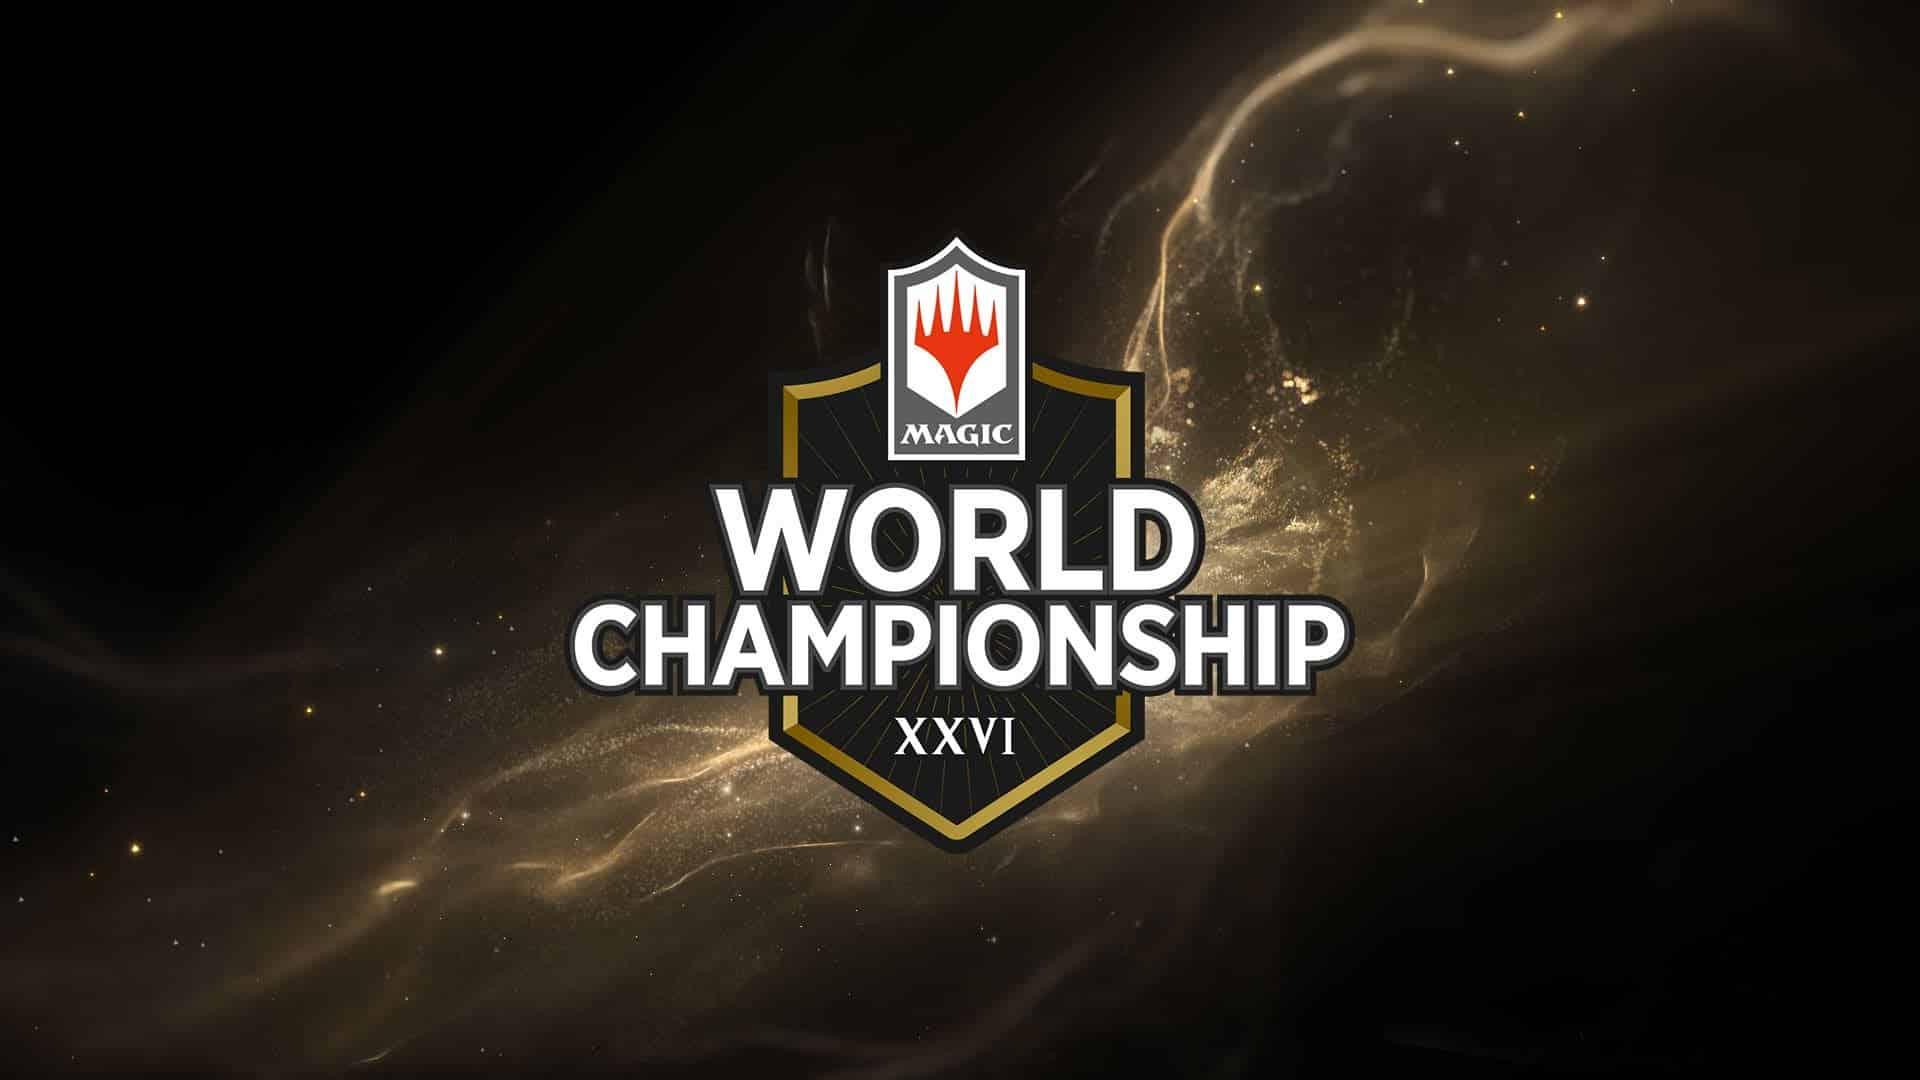 Magic The Gathering World Championships XXVII Cover